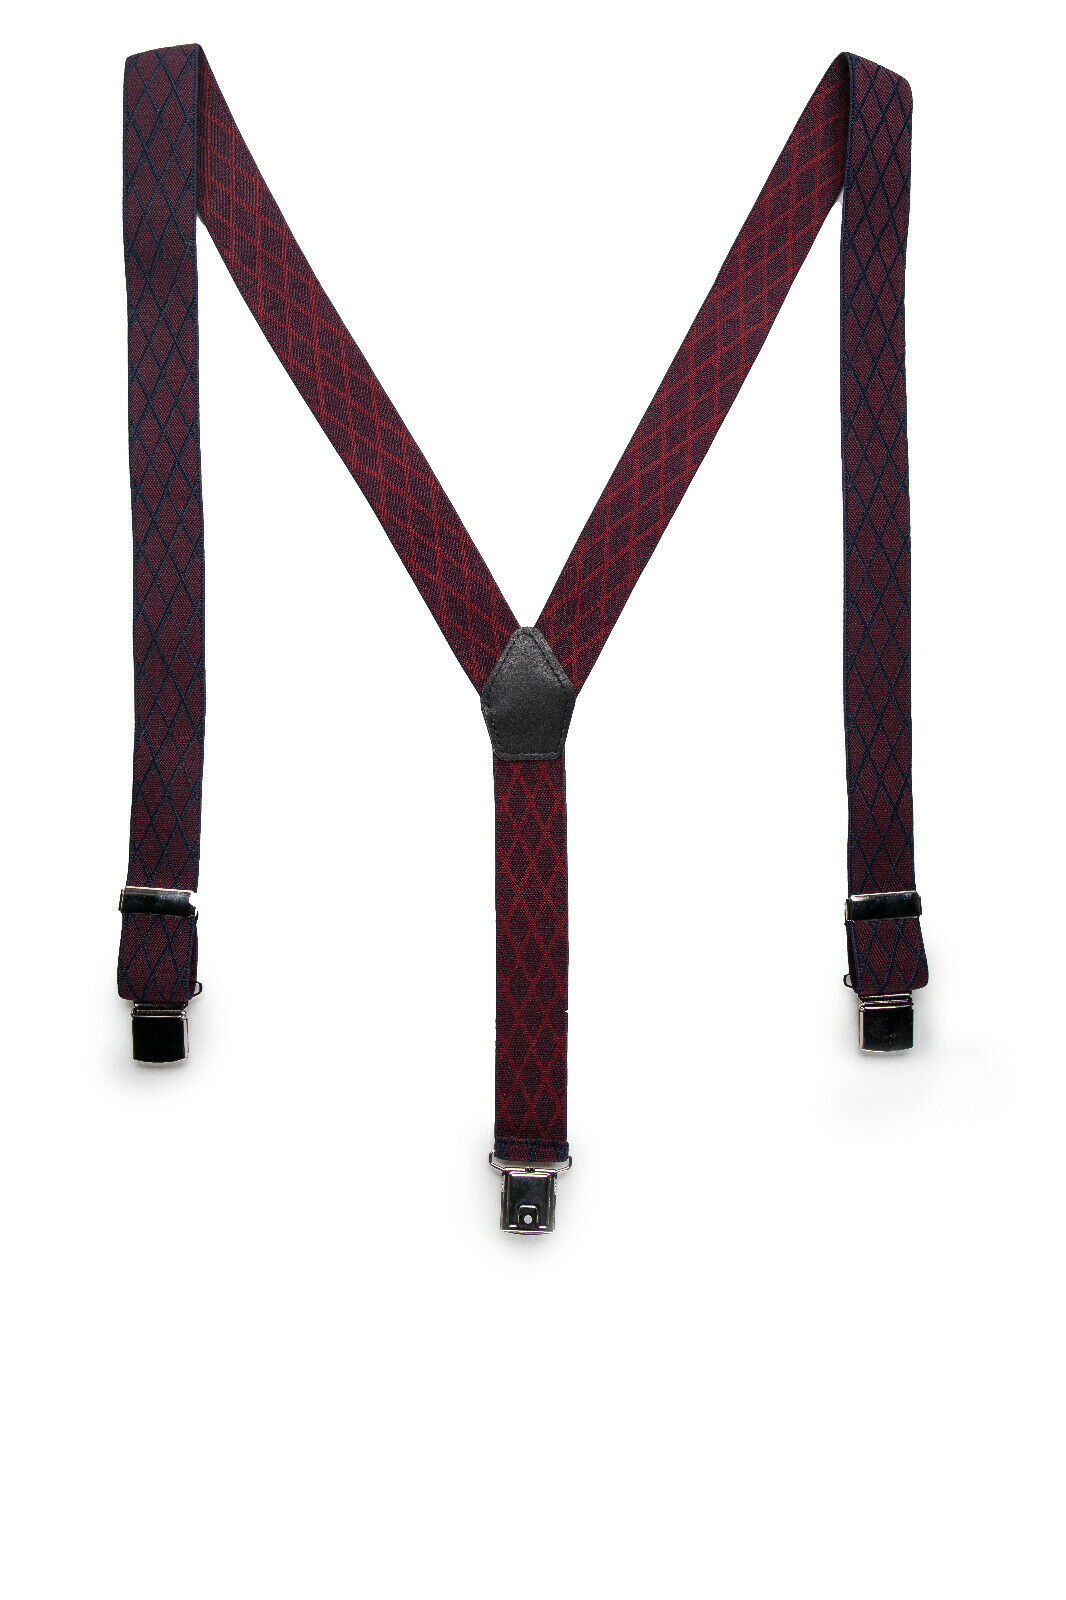 Clip Elegant Vegan Brace on Casual Plaid Flannel Bordeaux Elastic & Adjustable